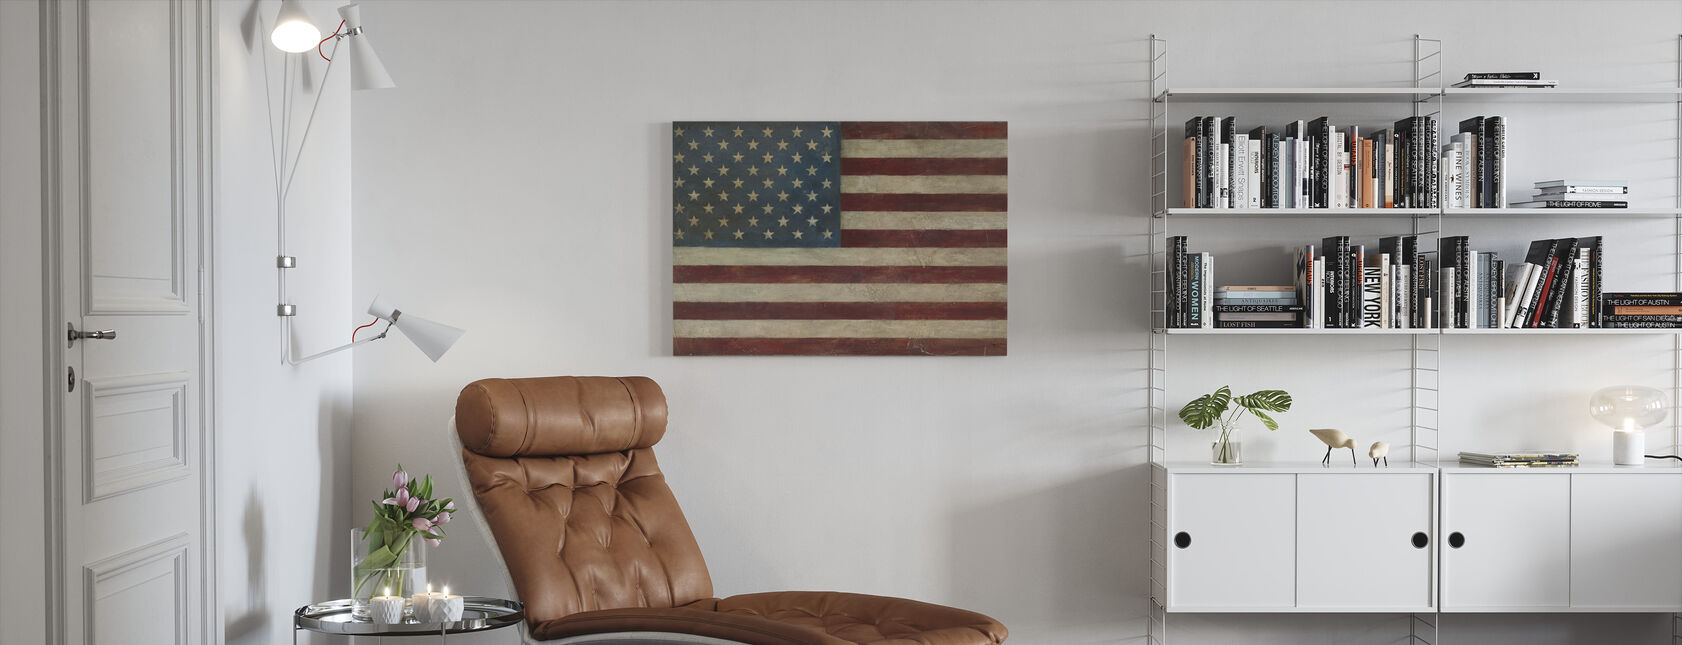 Avery Tillmon - Amerikansk Flag - Billede på lærred - Stue